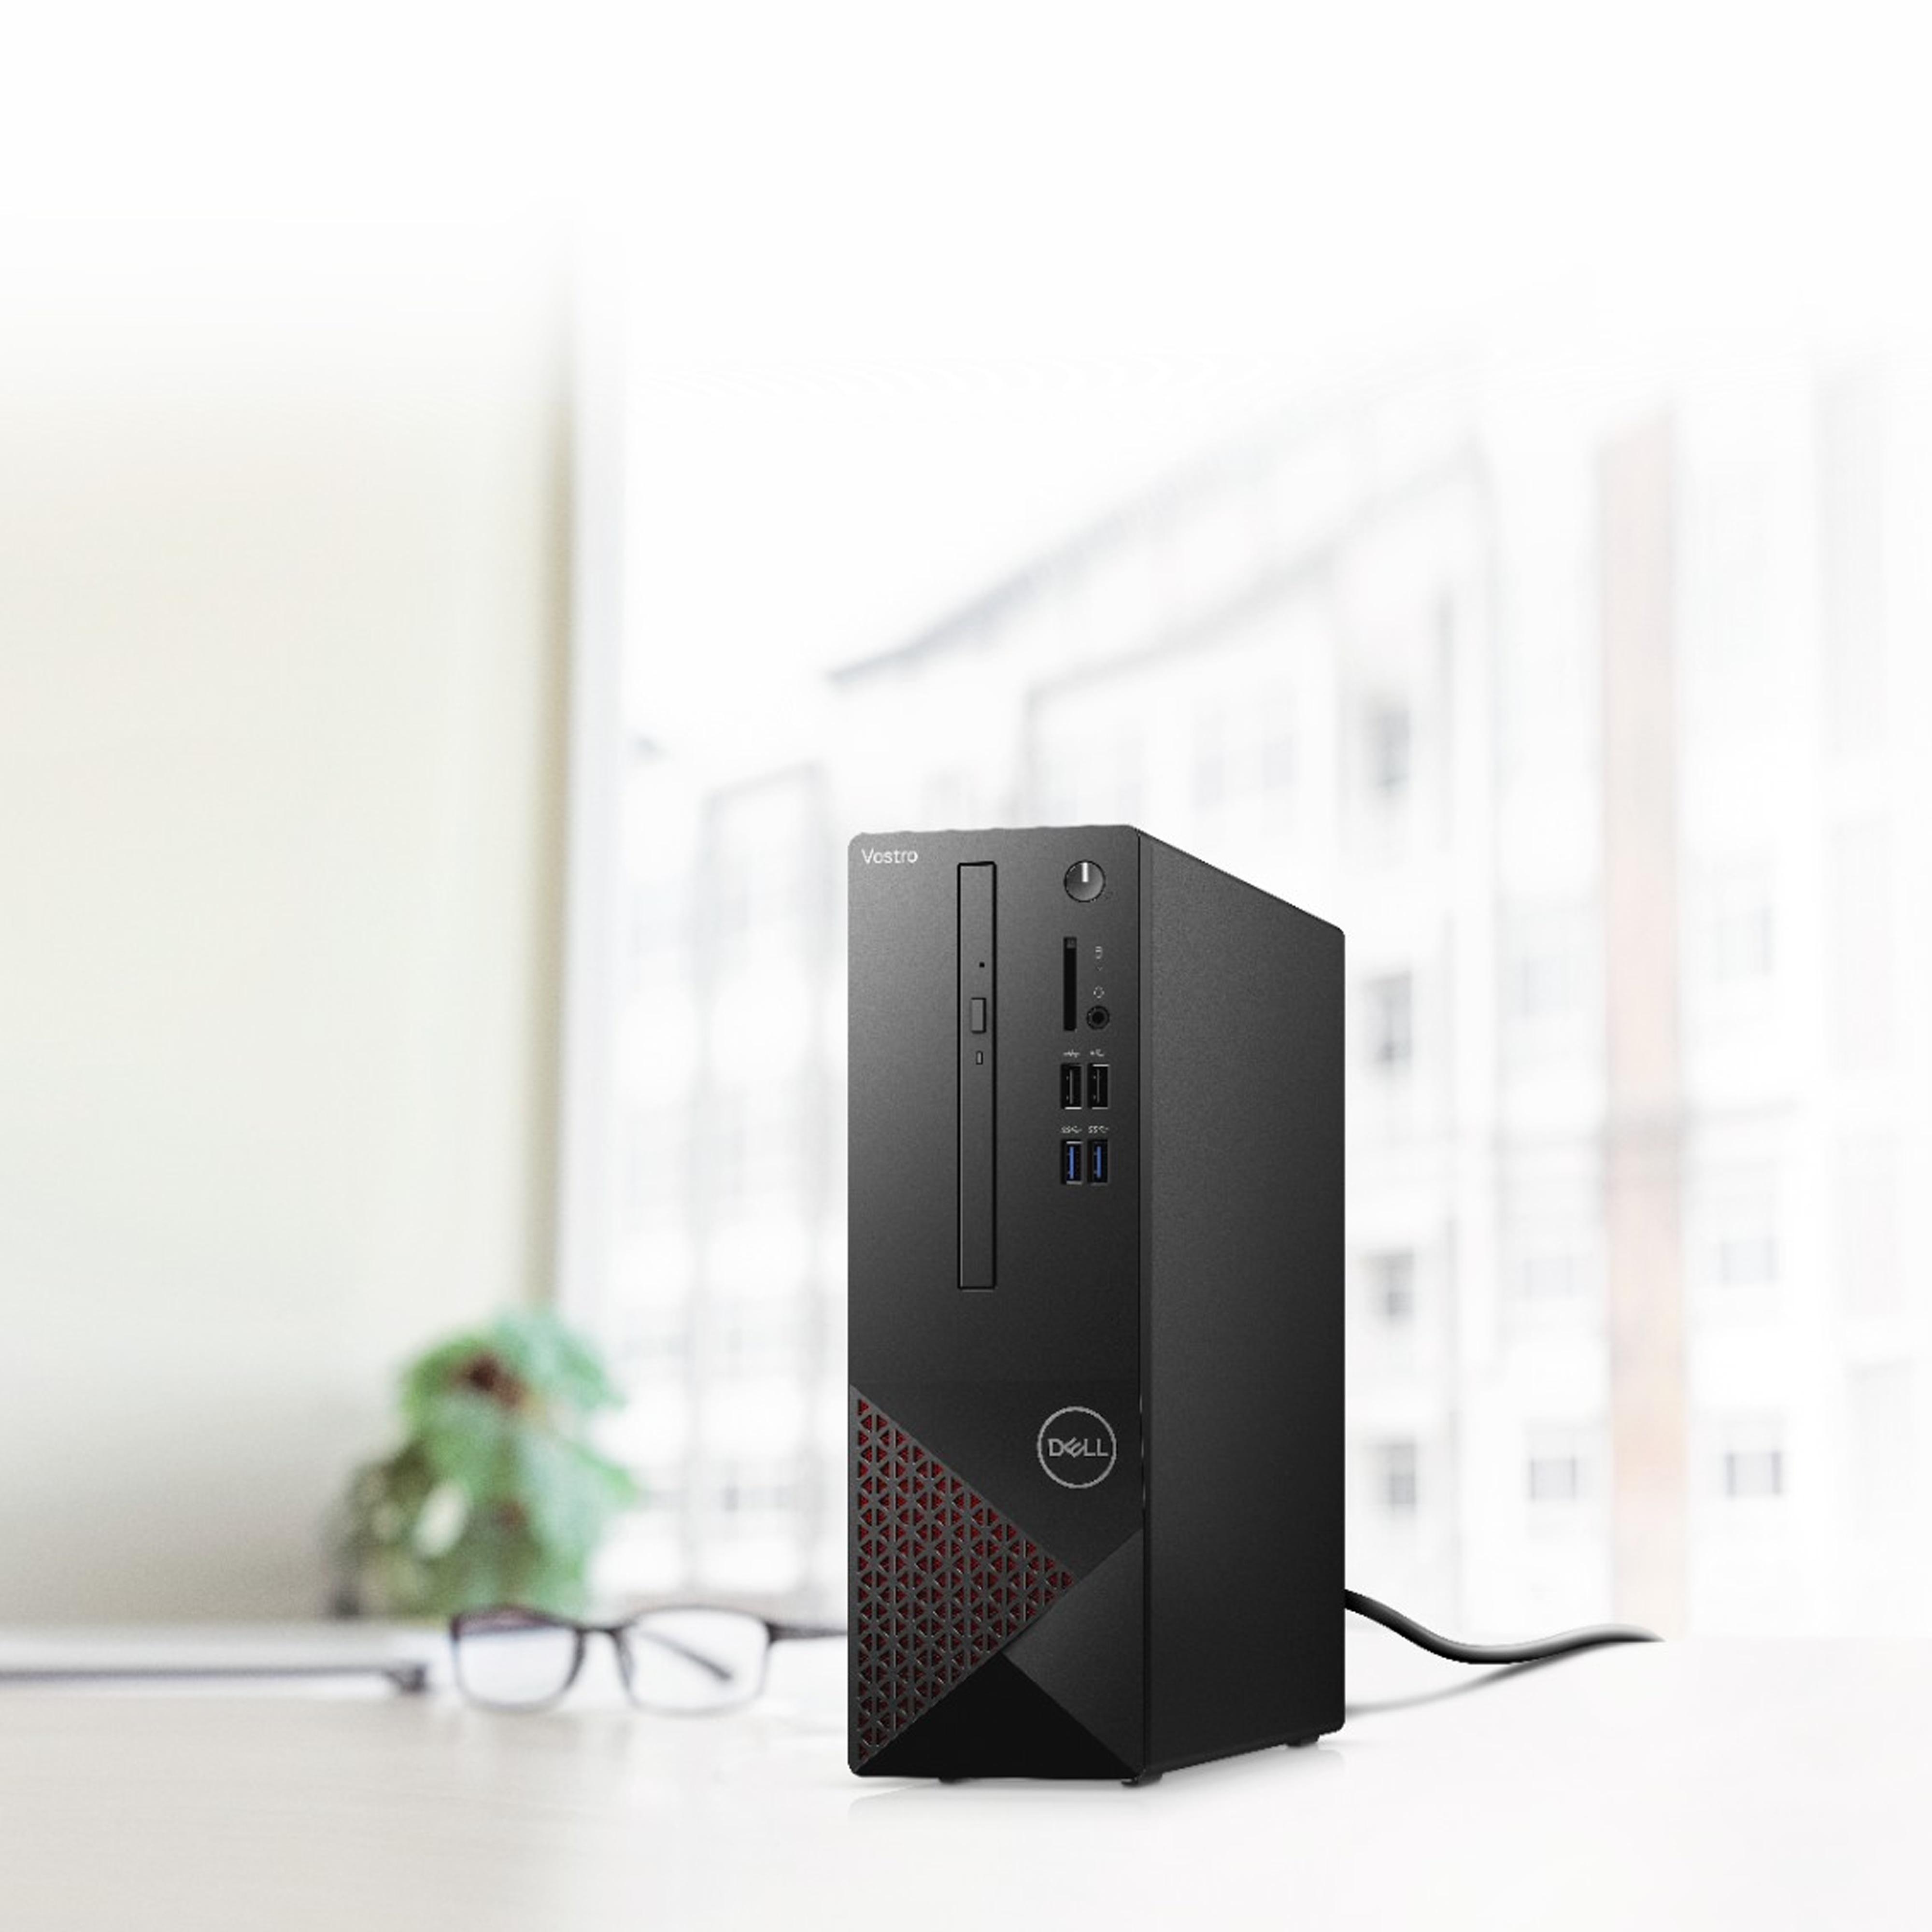 Novo Vostro Small Desktop